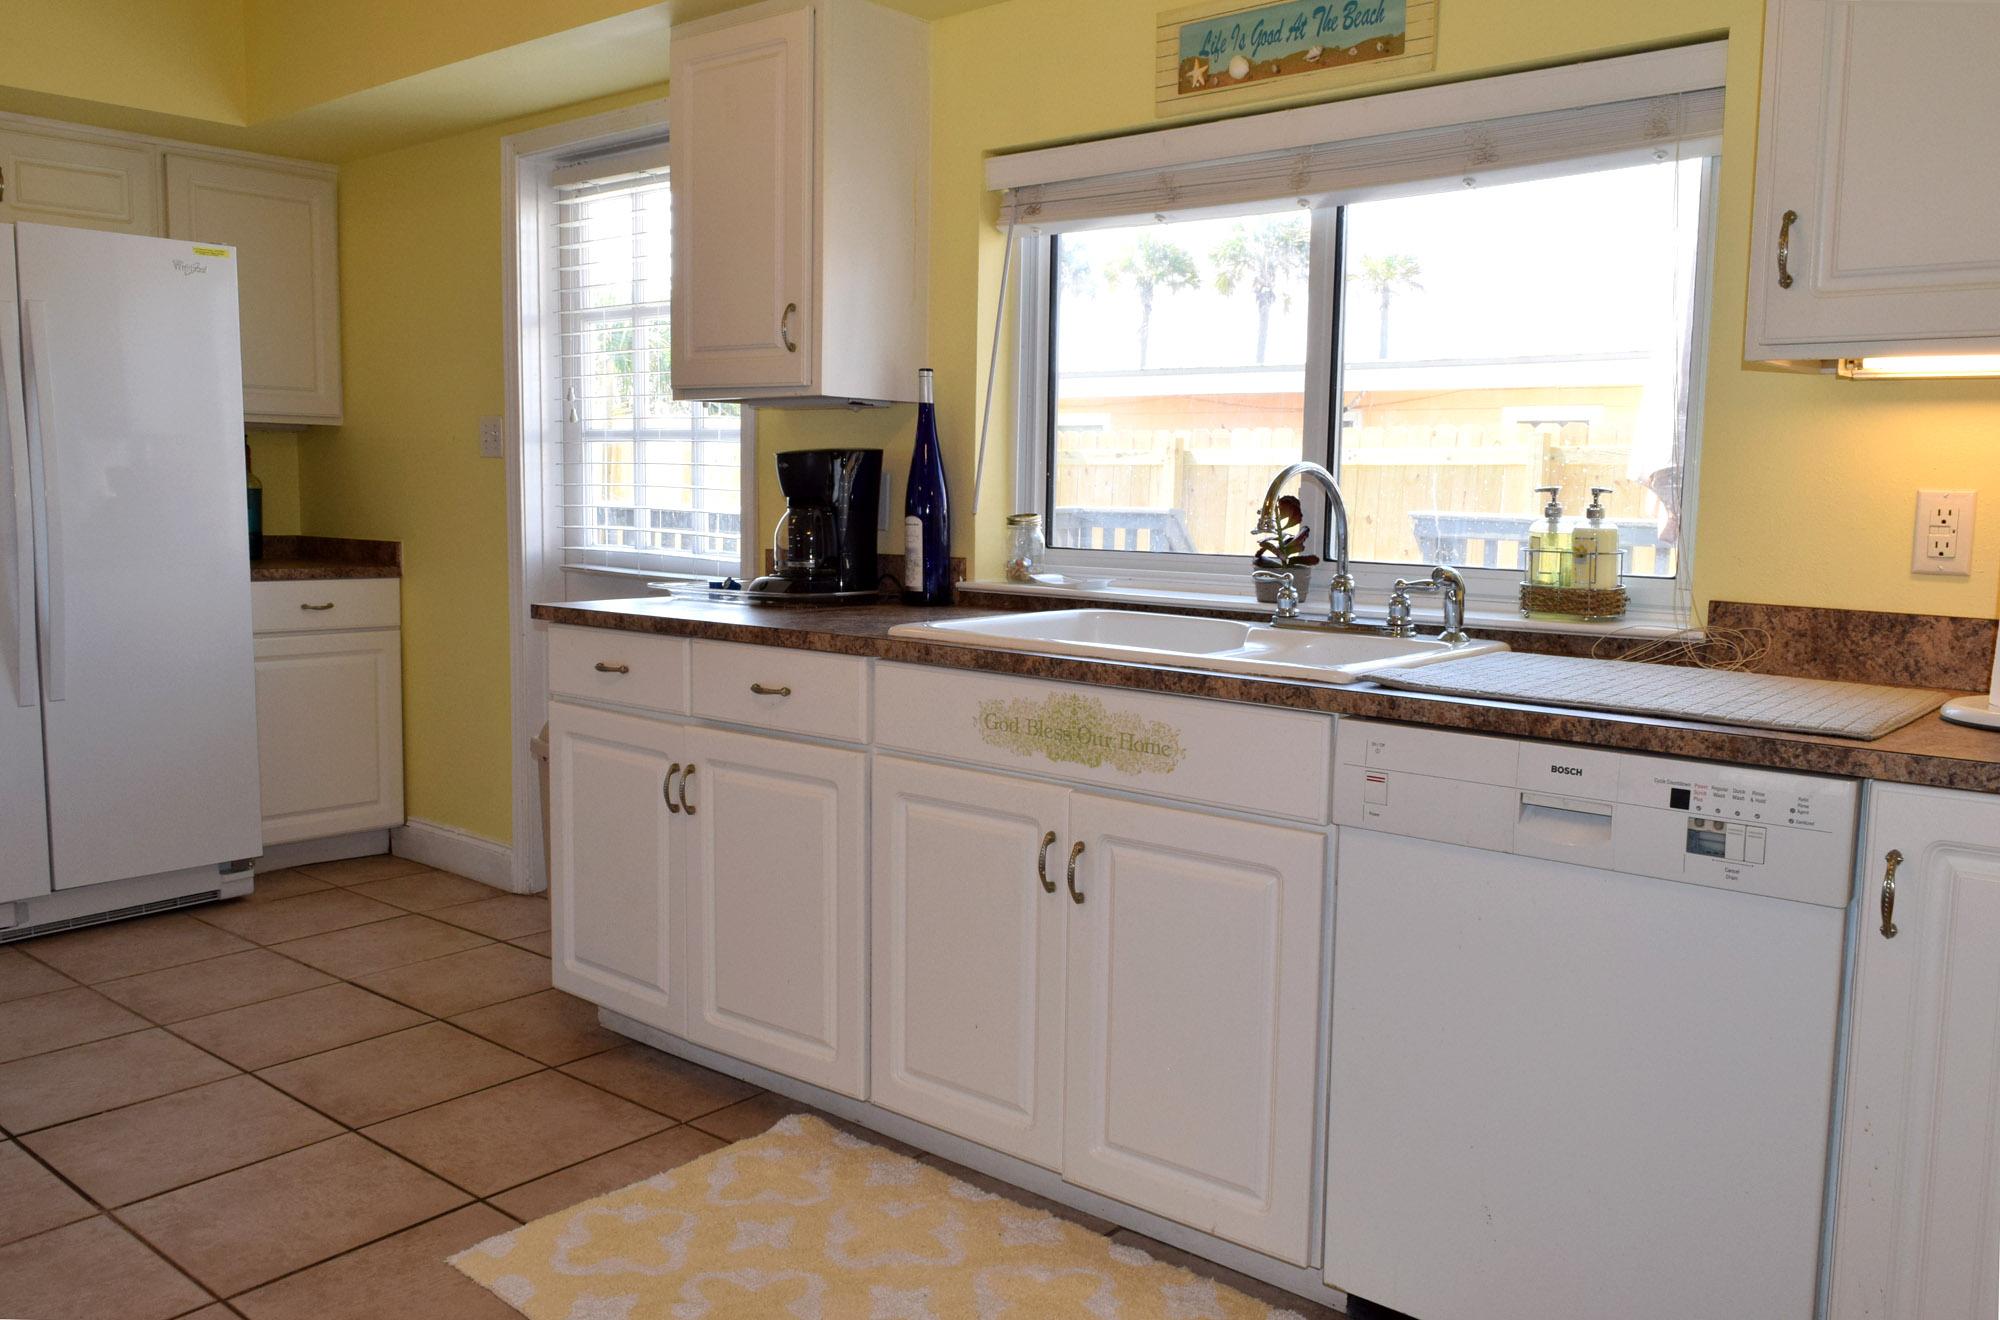 Maldonado 303 House/Cottage rental in Pensacola Beach House Rentals in Pensacola Beach Florida - #6